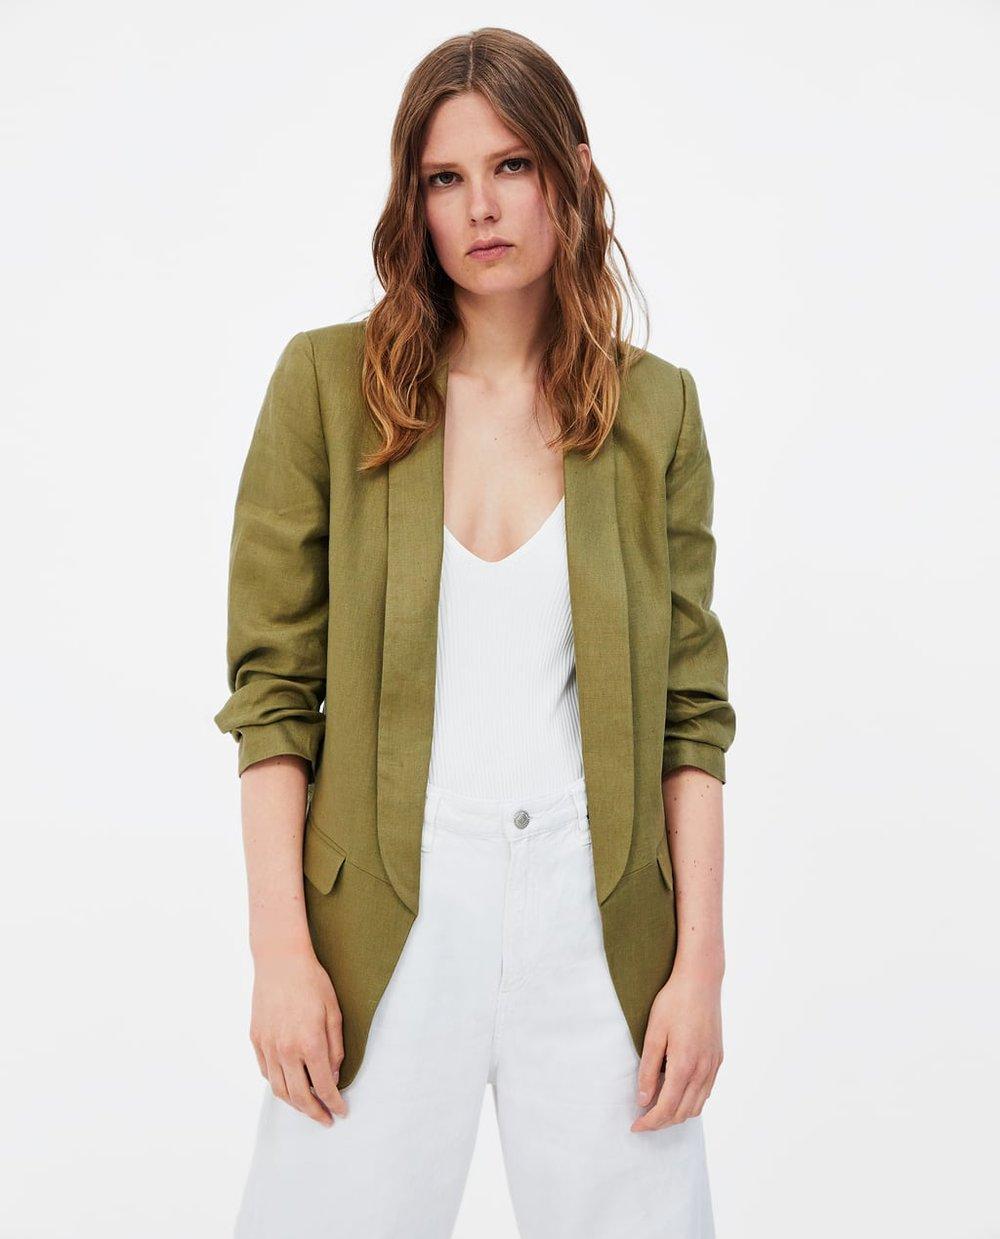 https://www.zara.com/ca/en/blazer-with-pleated-sleeves-p02943929.html?v1=6363538&v2=968863